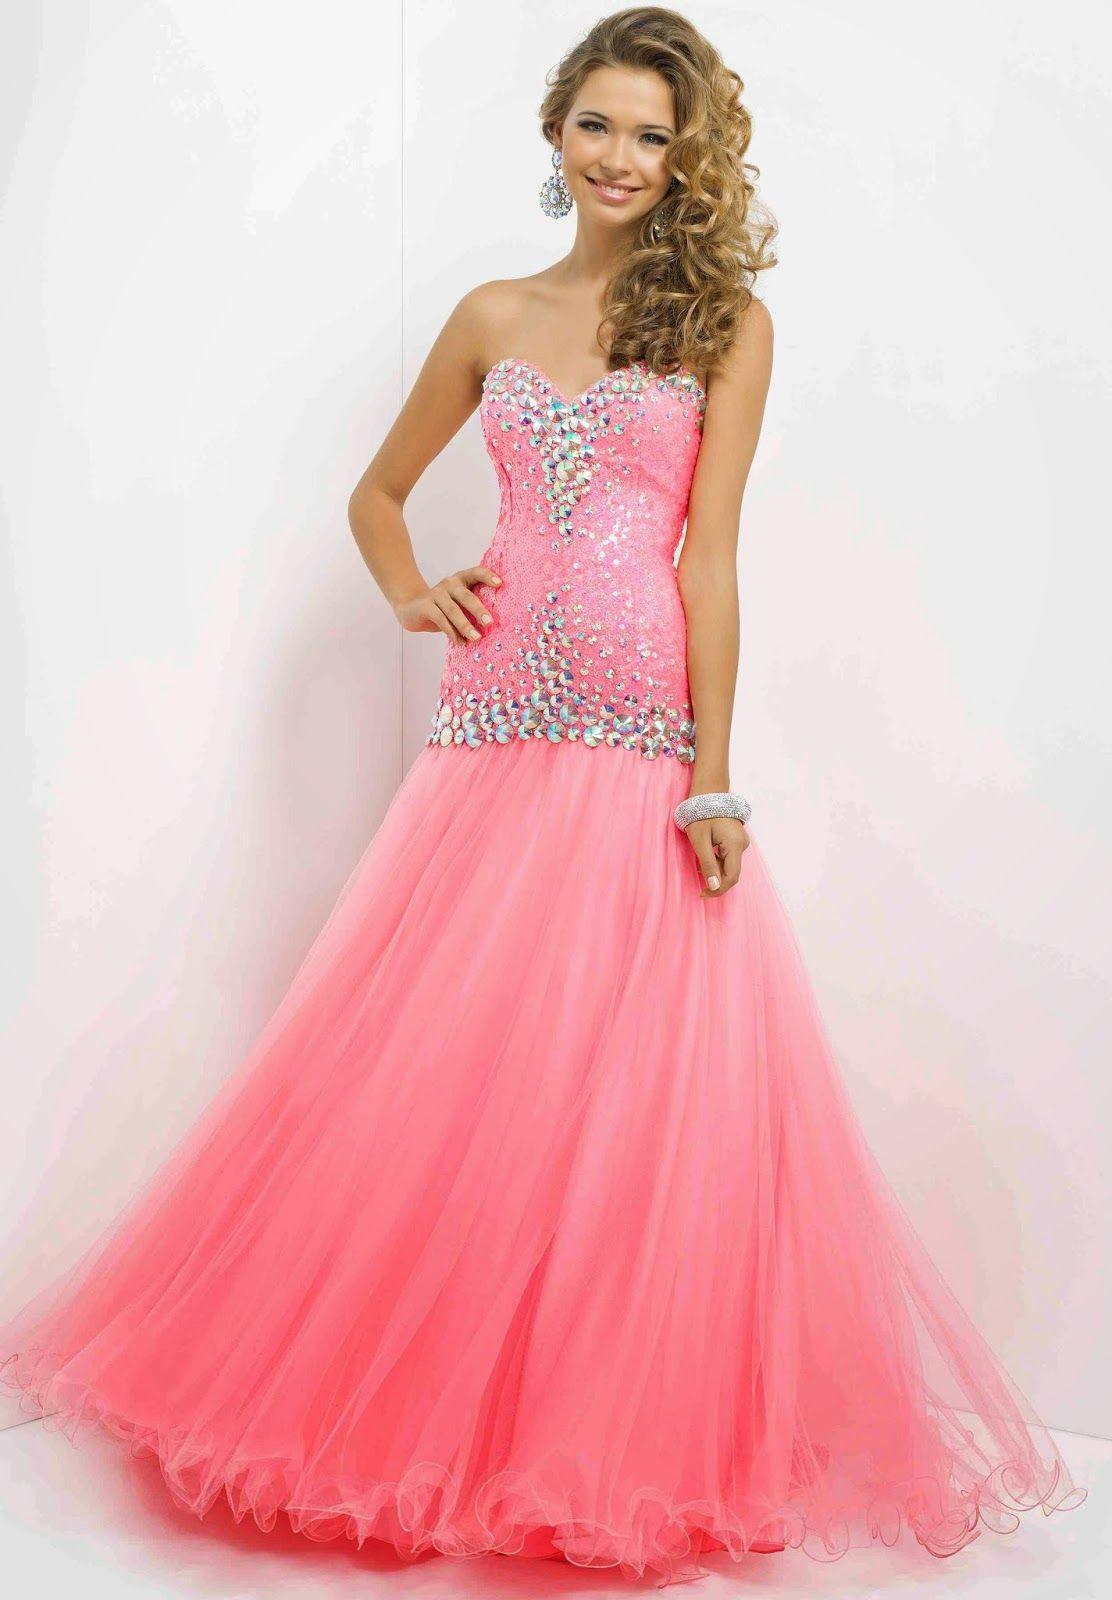 Elegantes vestidos largos de fiesta | Vestidos | Pinterest | Vestido ...